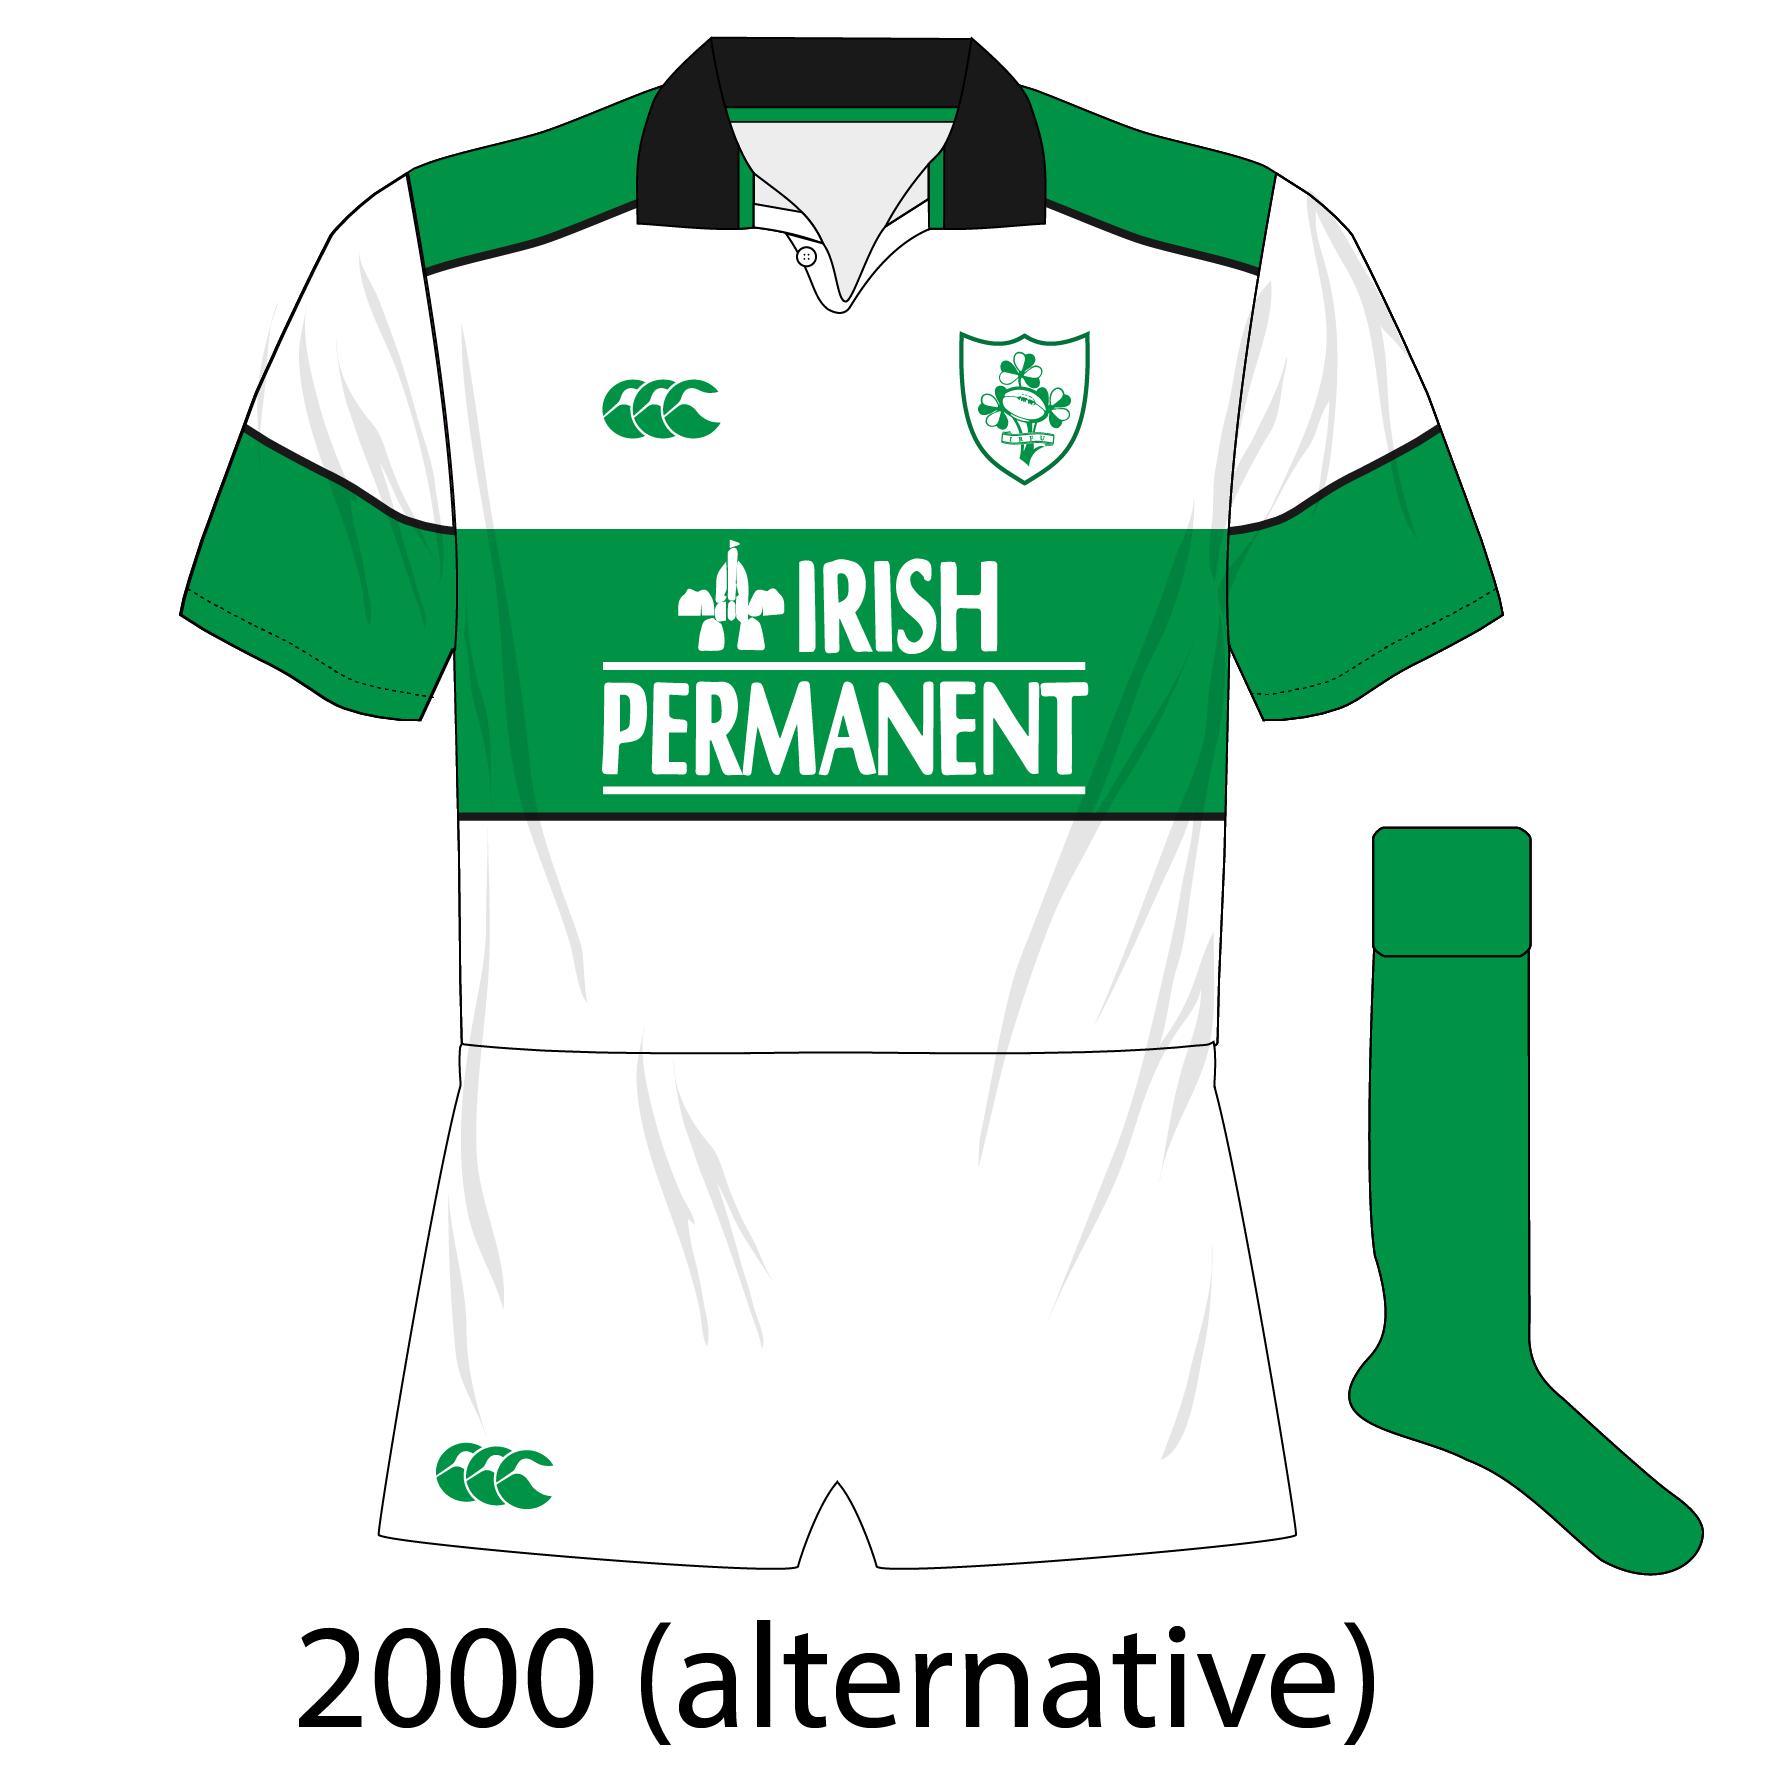 2000-Ireland-Canterbury-rugby-alternative-jersey-South-Africa-Irish